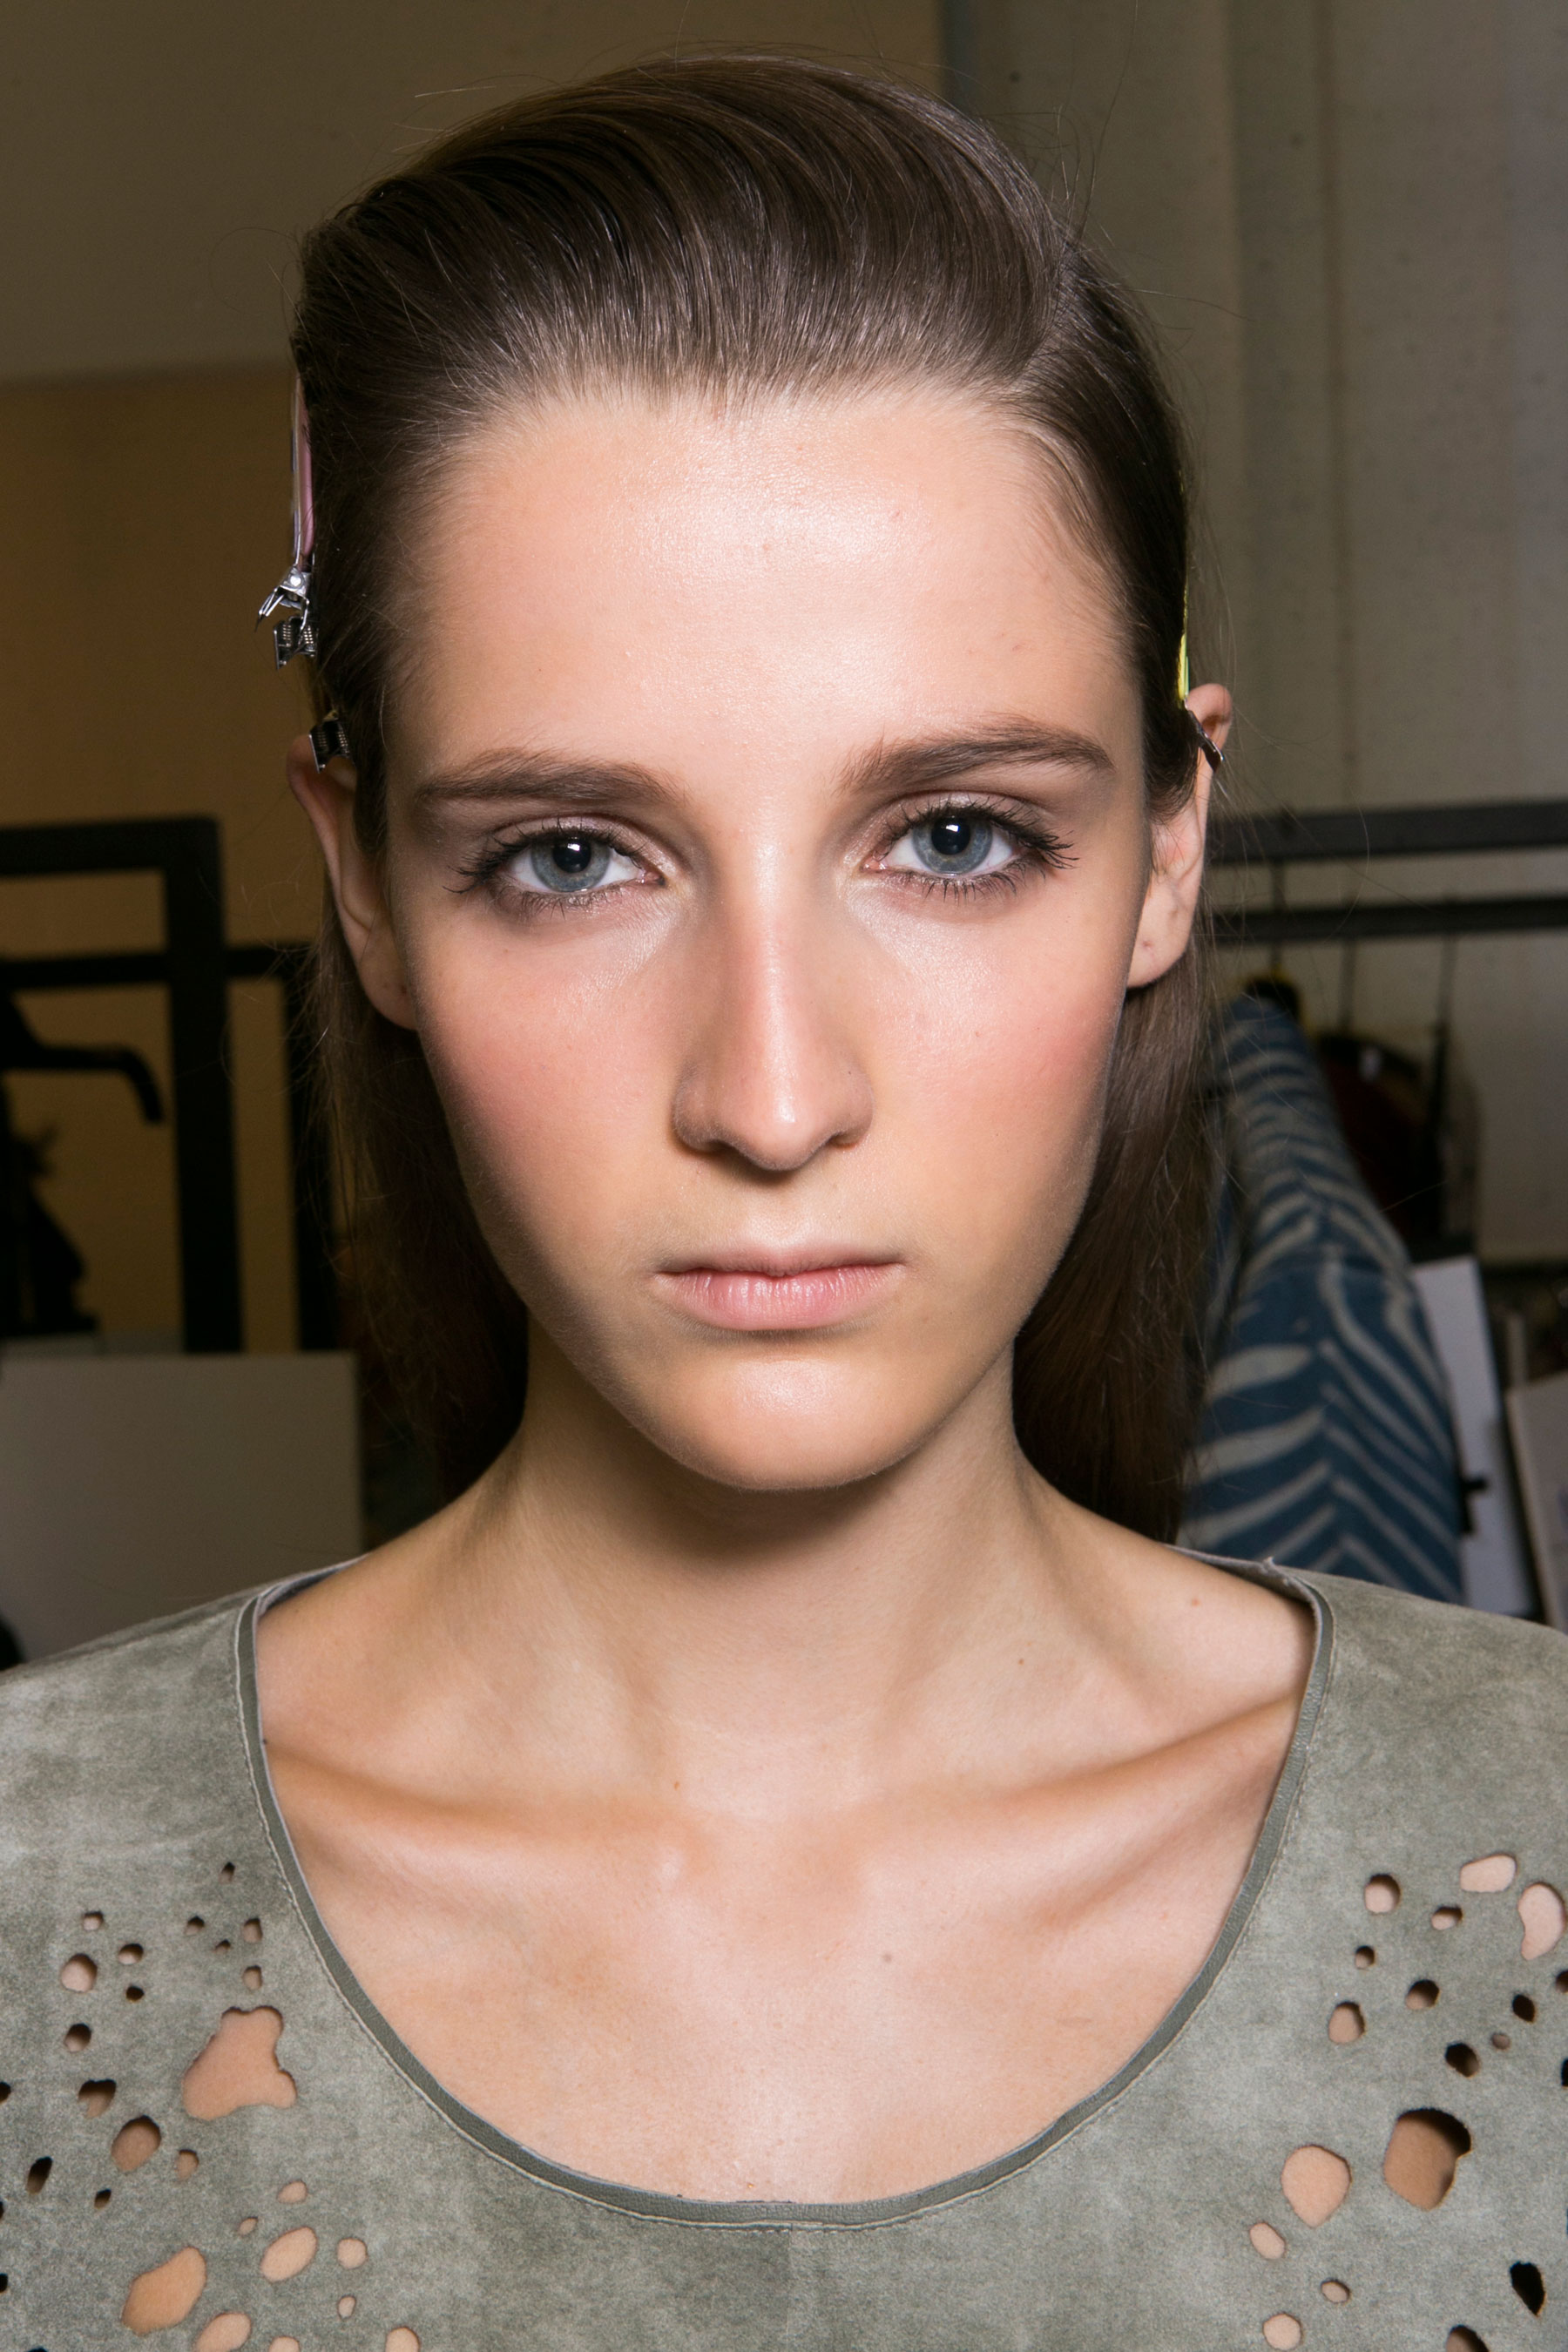 Roberto-Cavalli-Backstage-beauty-spring-2016-close-up-fashion-show-the-impression-001